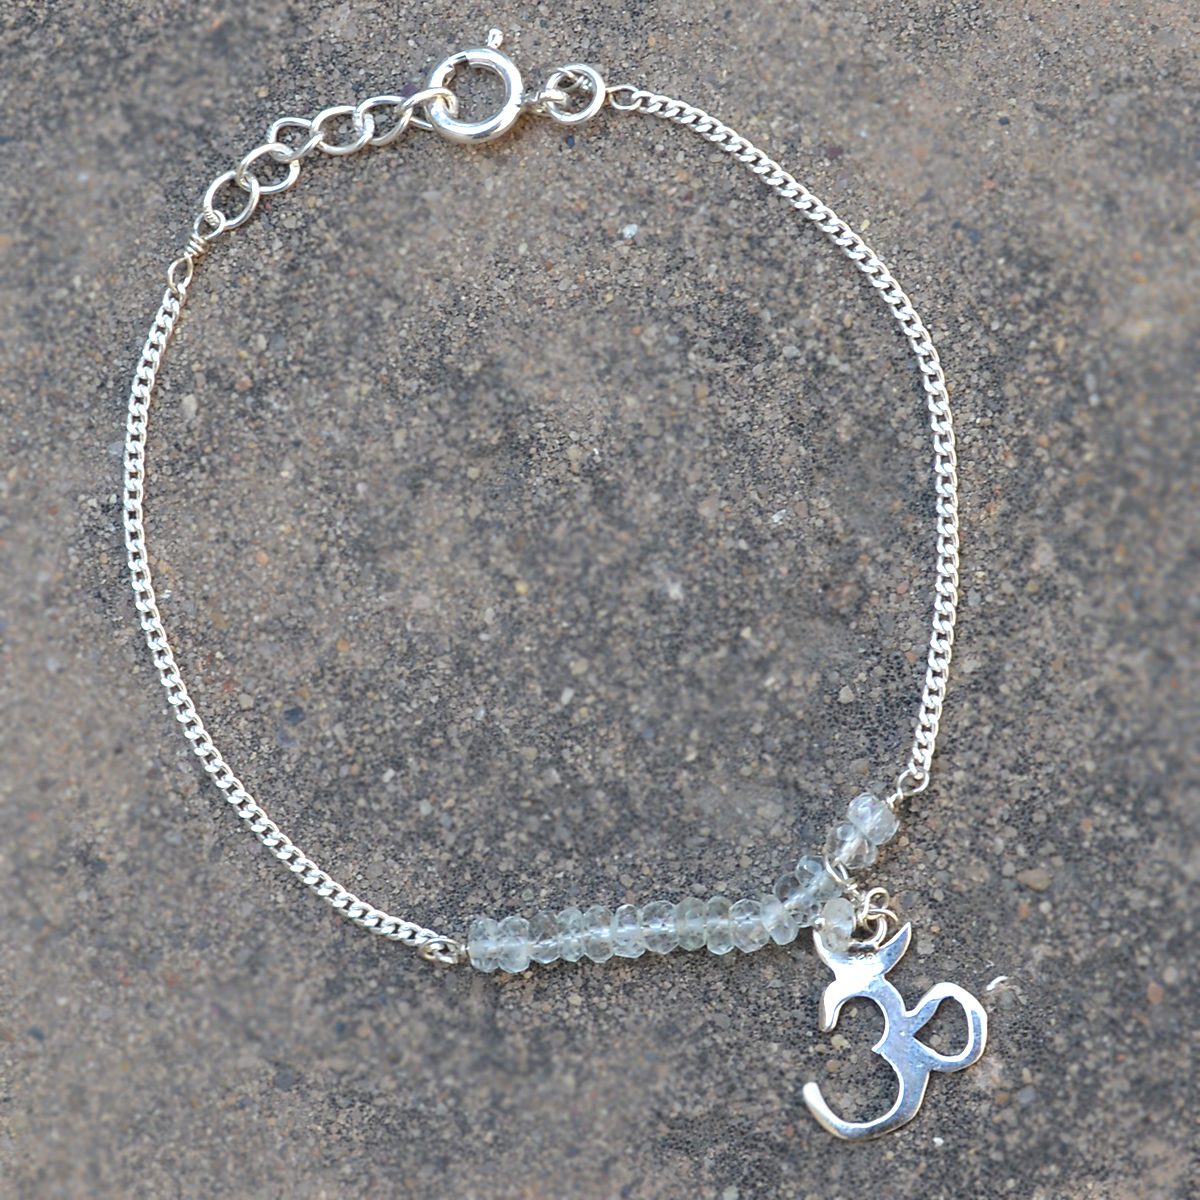 Crystal Gemstone Silver Bracelet PG-155896